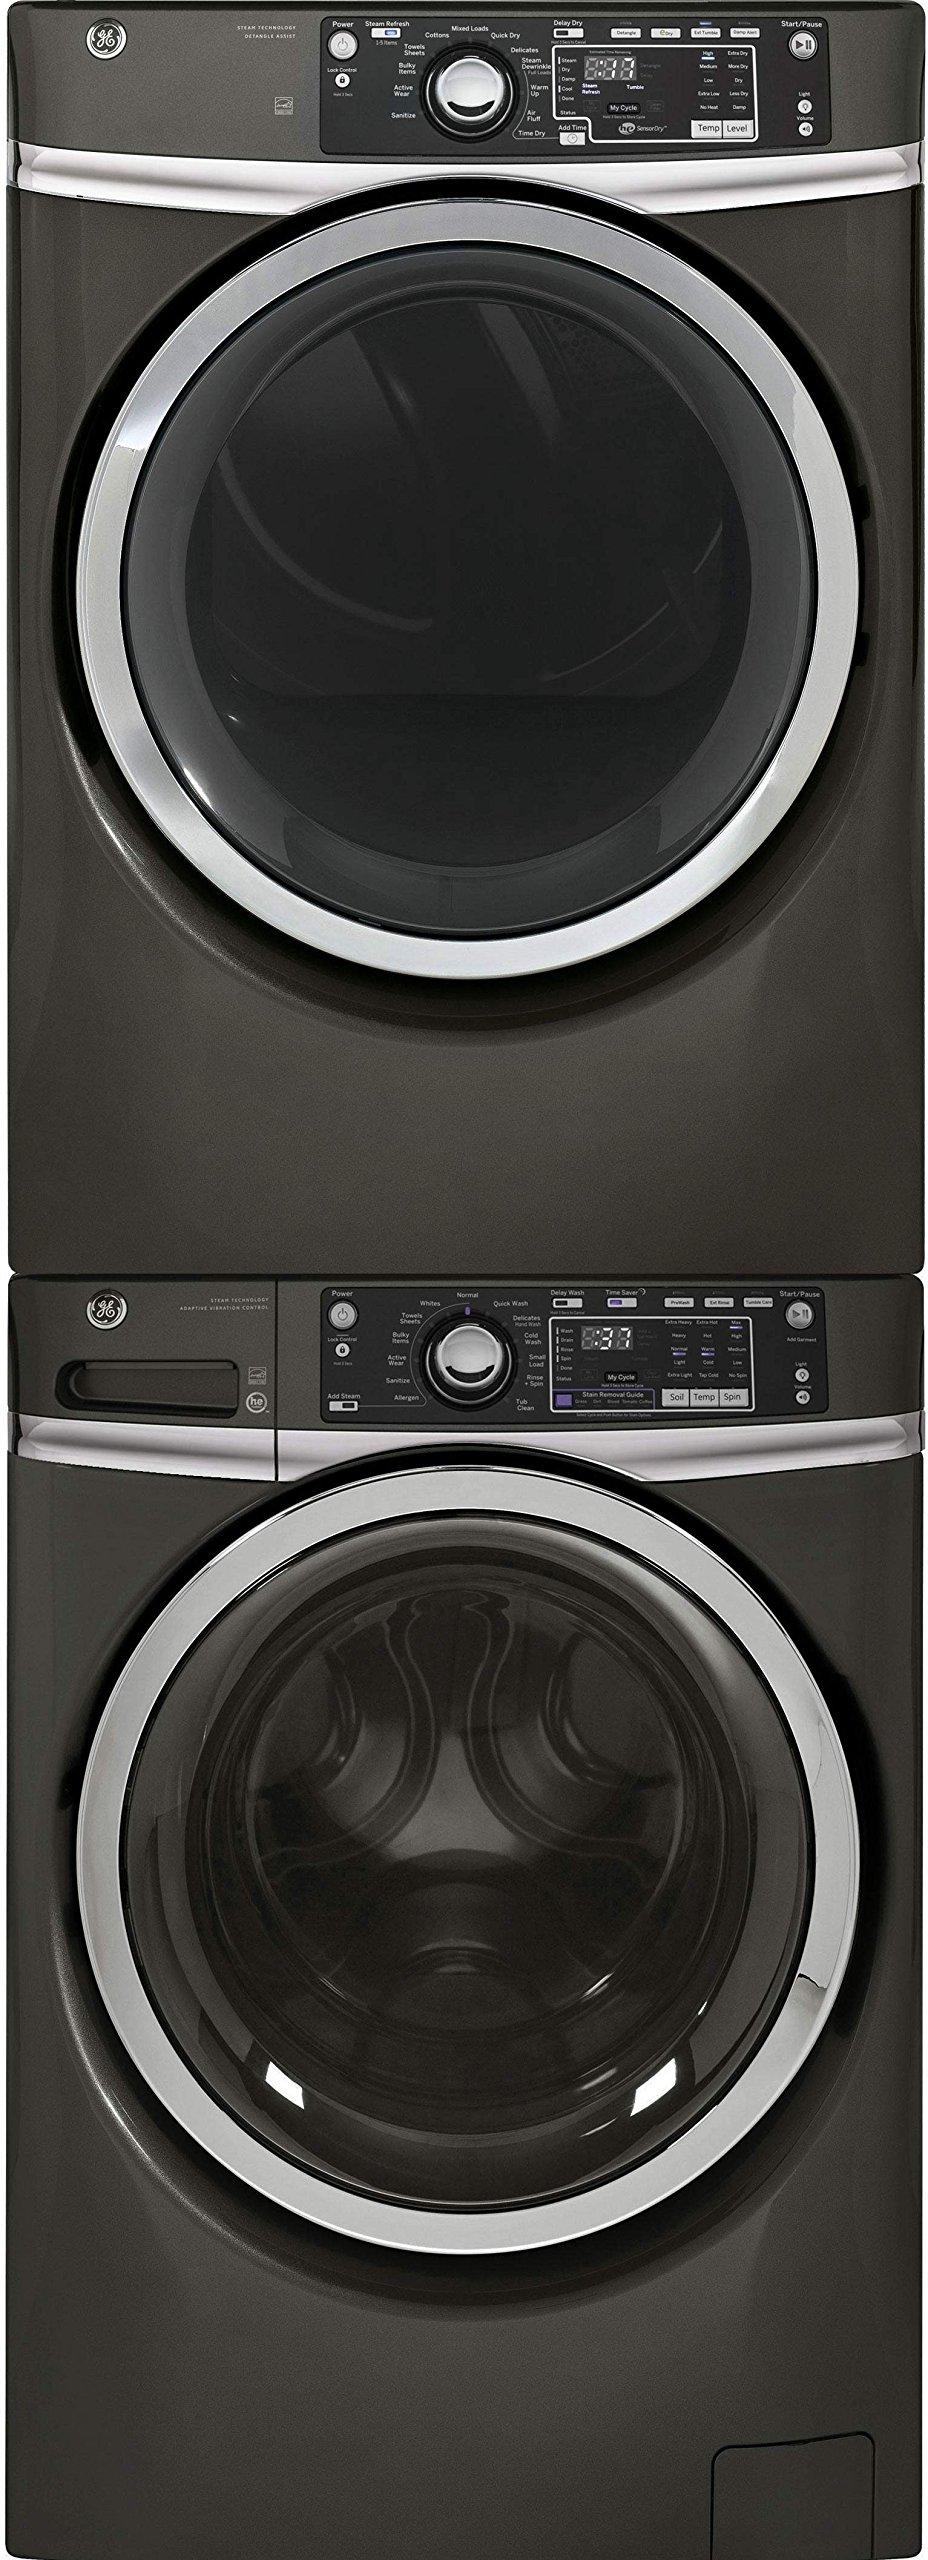 "GE Diamond Grey Front Load Washer with GFW480SPKDG 28"" Washer, GFD48GSPKDG 28"" Gas Dryer and GEFLSTACK Stacking Kit"